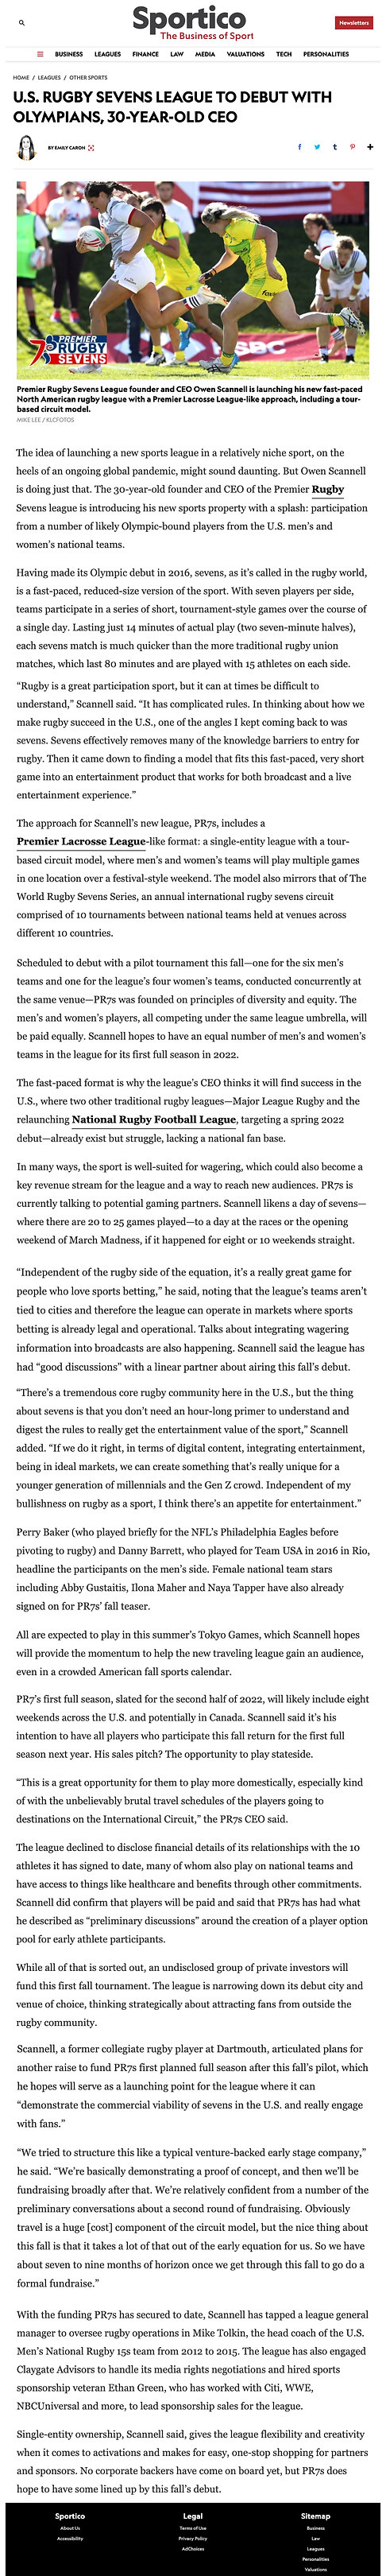 Sportico Rugby JPEG.jpg